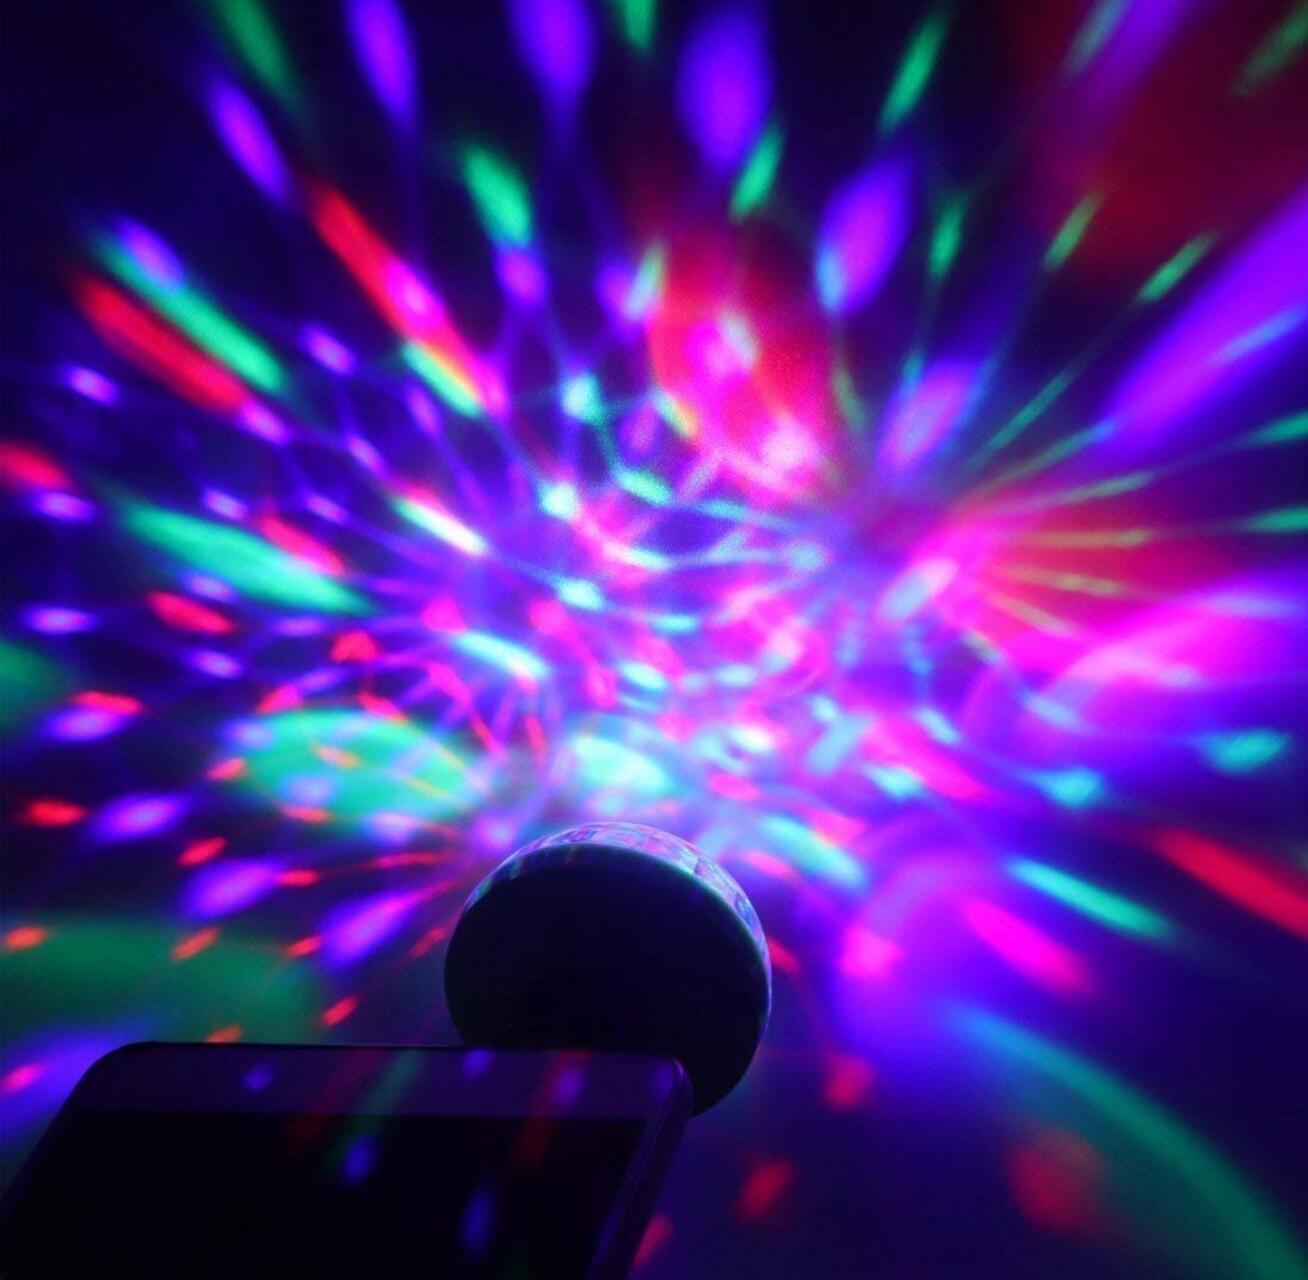 LED COCHE USB luz decorativa Mini DJ RGB colorida música sonido atmósfera lámpara para USB-C superficie del teléfono Festival Fiesta Karaoke